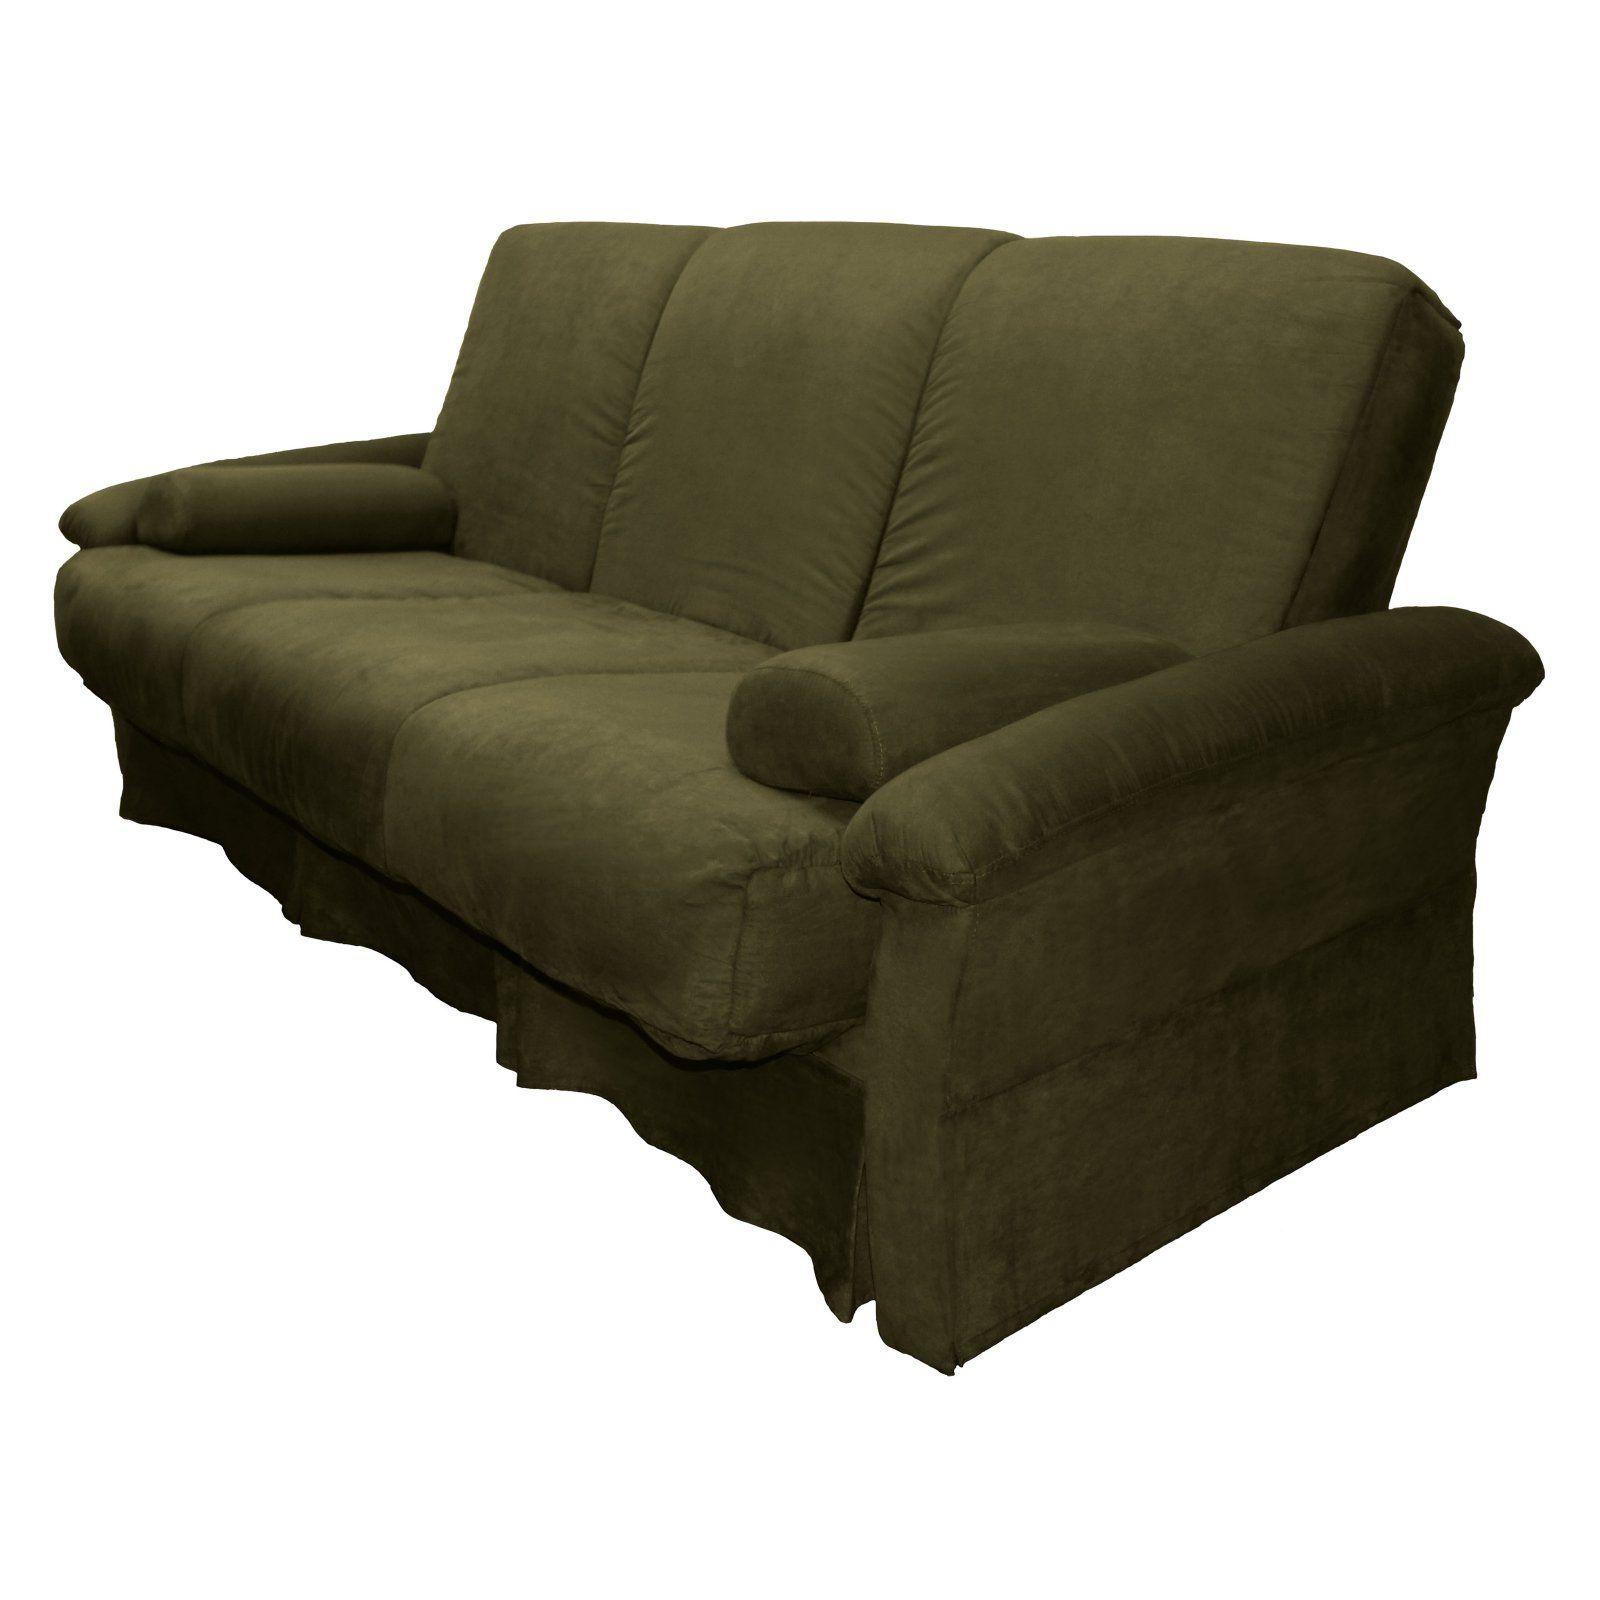 Epic Home Furnishings Sit Sleep Pillow Top Sofa Sleeper